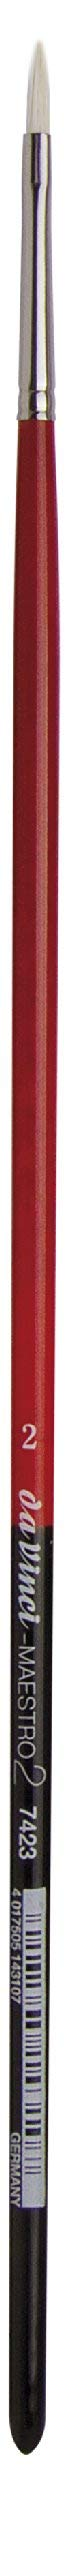 da Vinci Hog Bristle Series 7423 Maestro 2 Artist Paint Brush, Filbert with European Sizing, Size 2